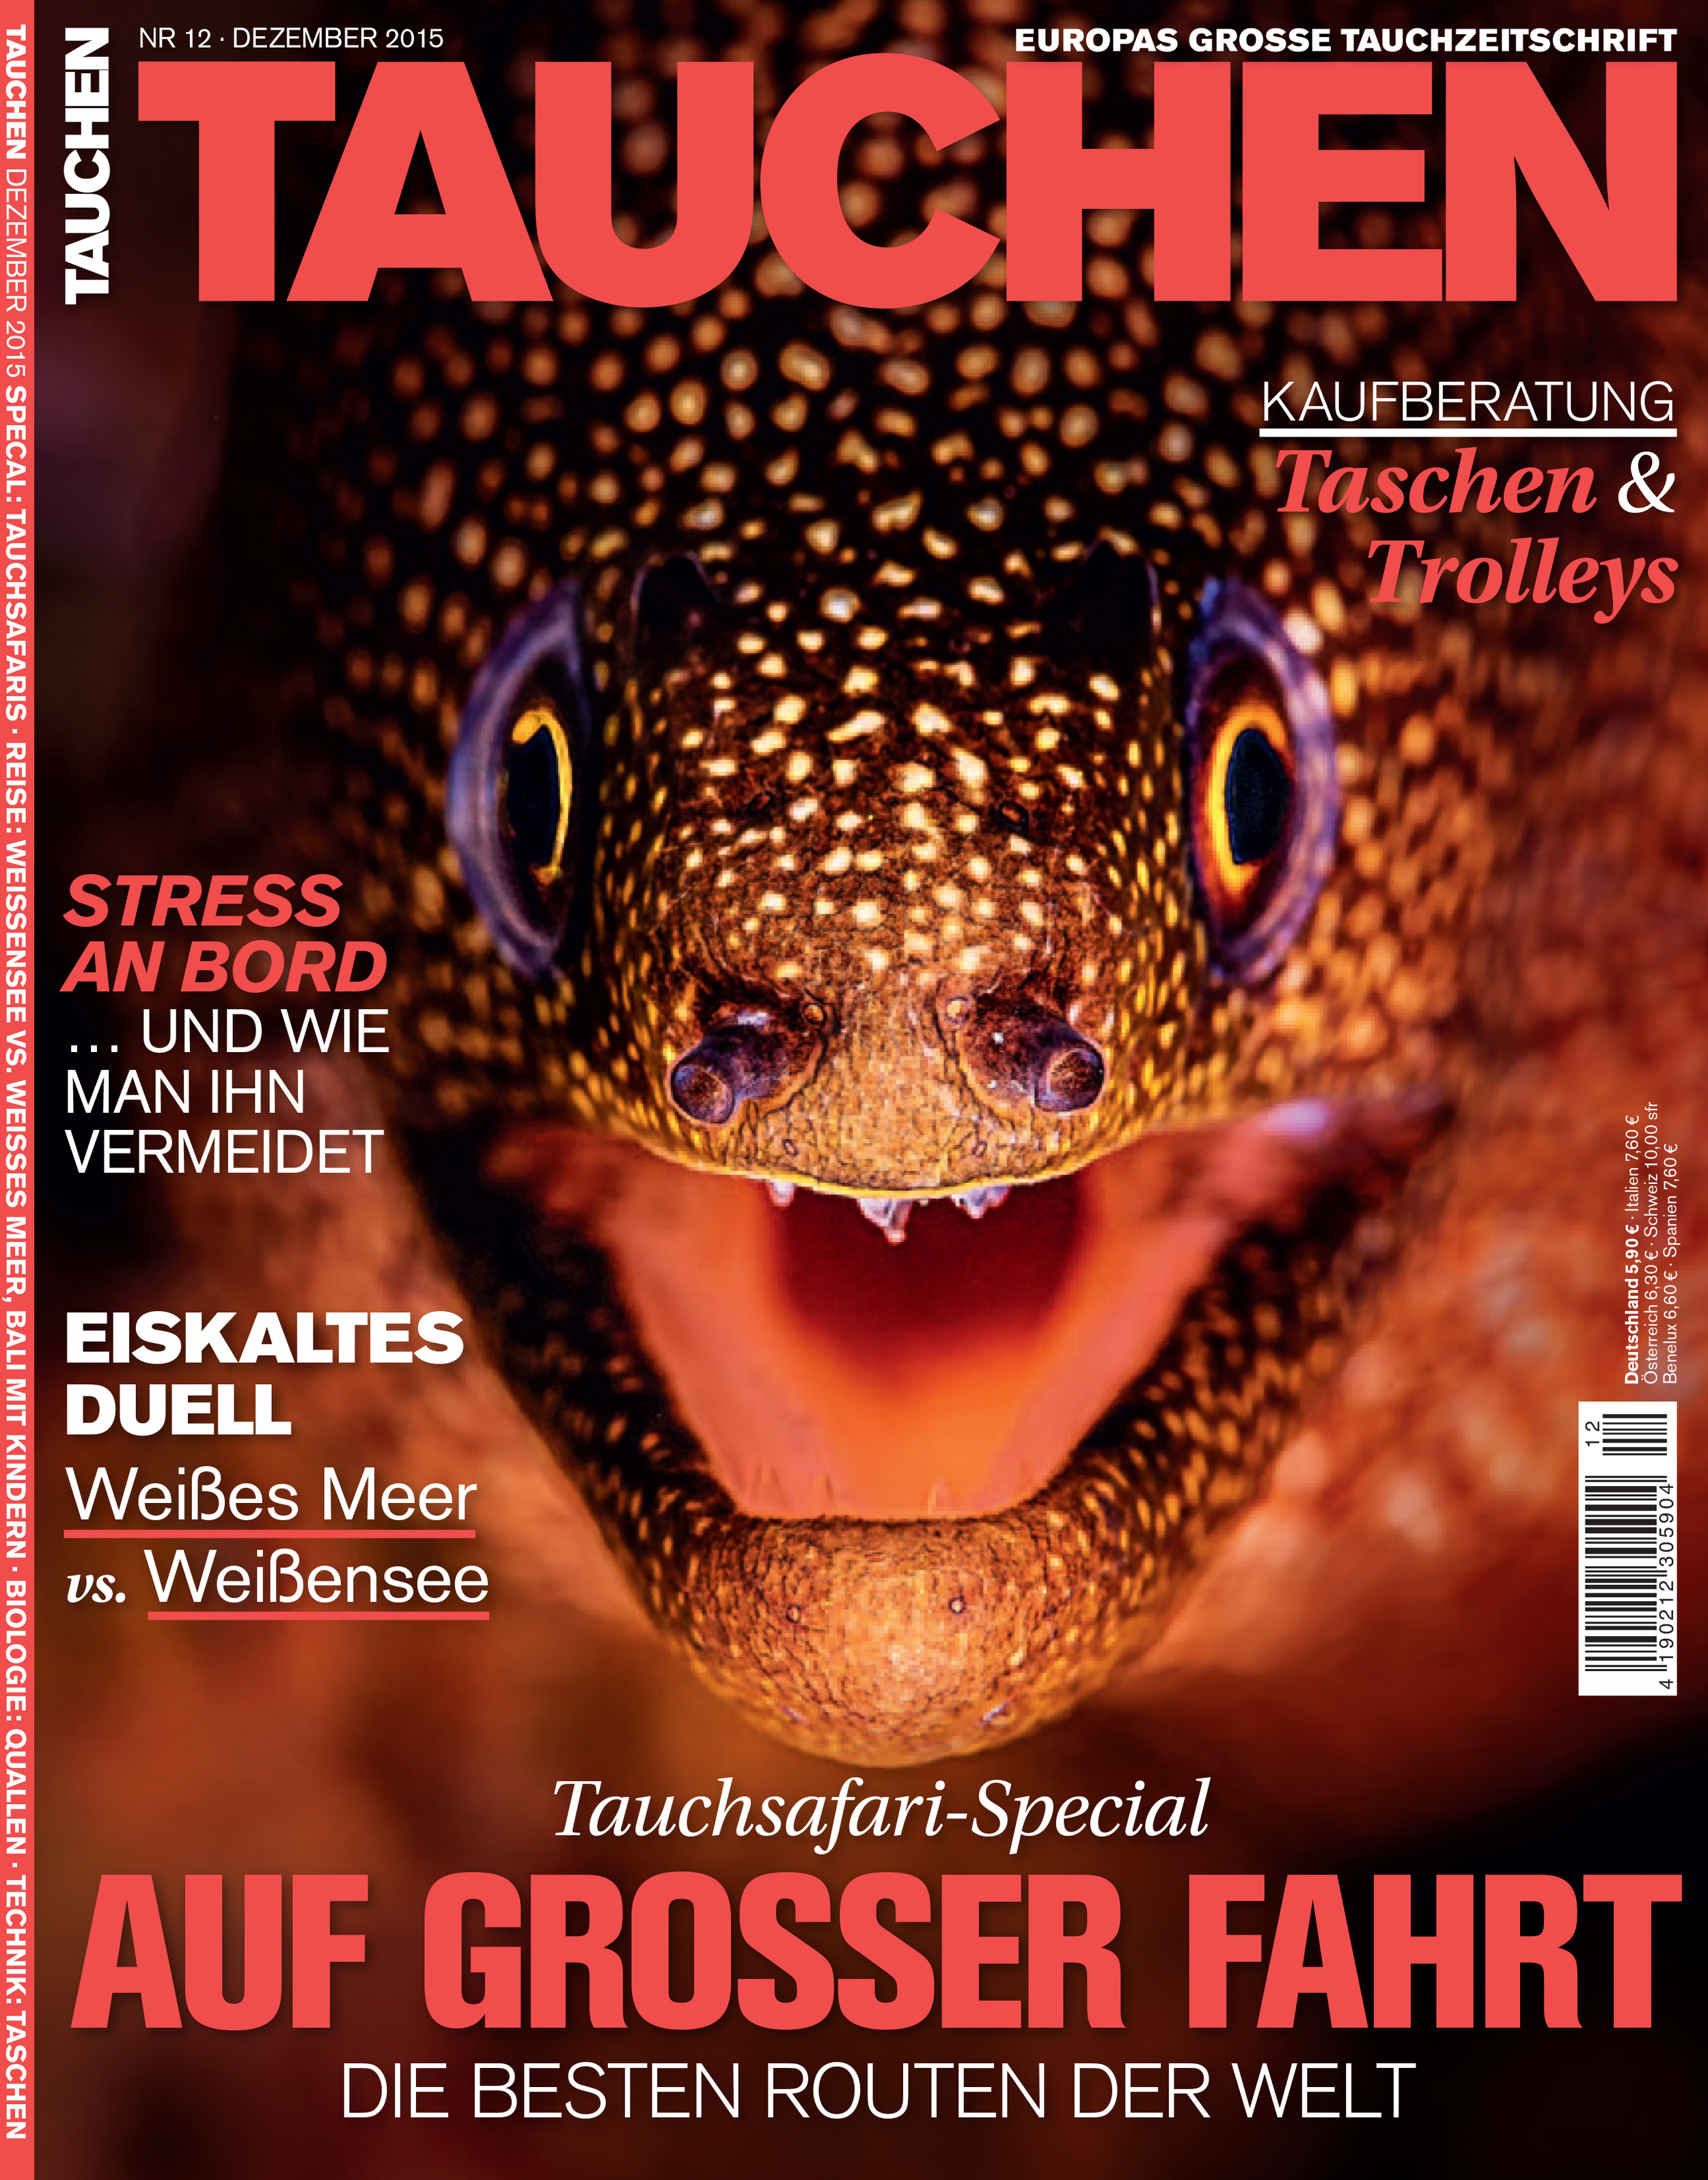 Beth Watson cover shot Tauchen Magazine